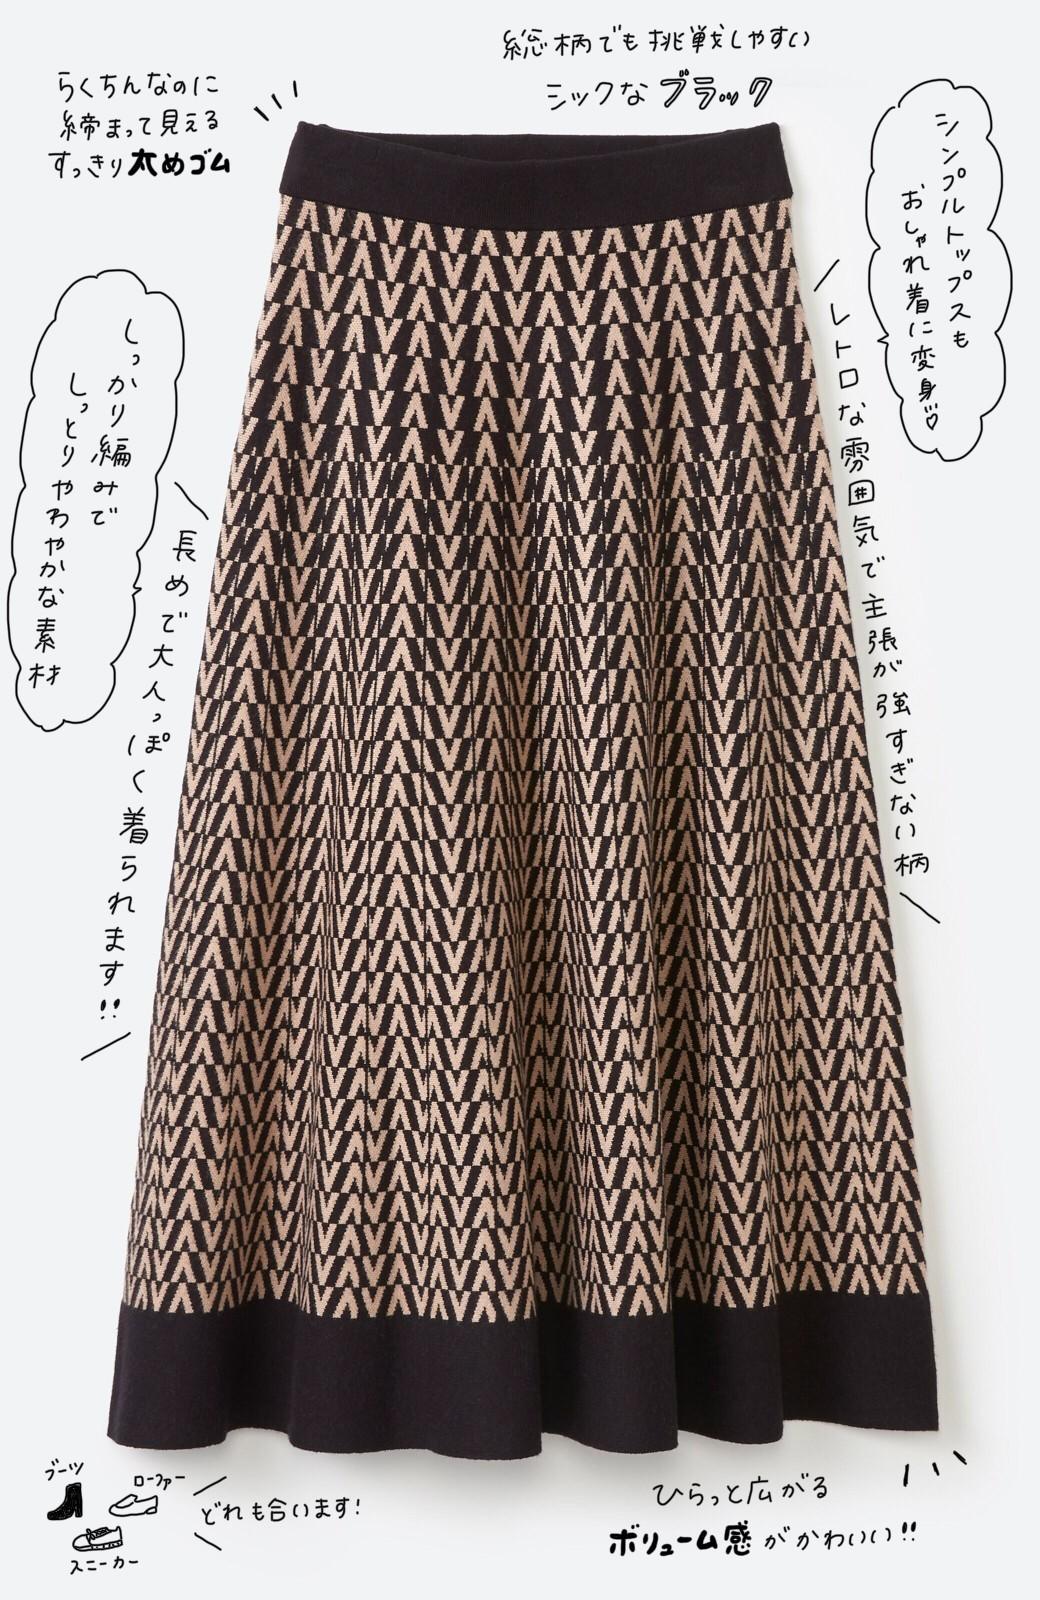 haco! シンプルトップスと合わせるだけでコーデがオシャレ&華やかになる ジャカードニットスカート <ブラック系その他>の商品写真1